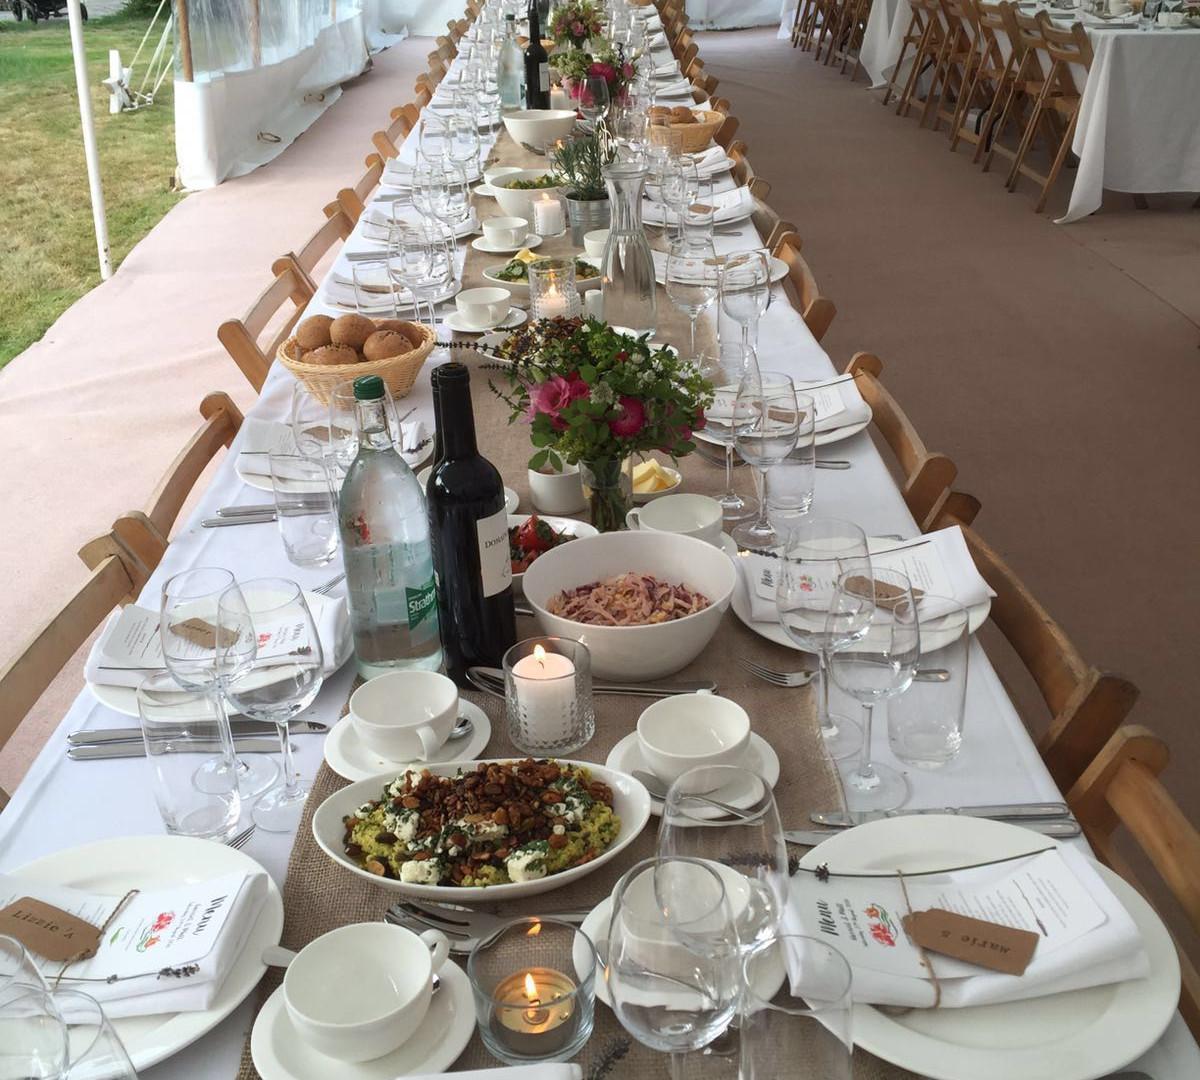 Sharing Tables